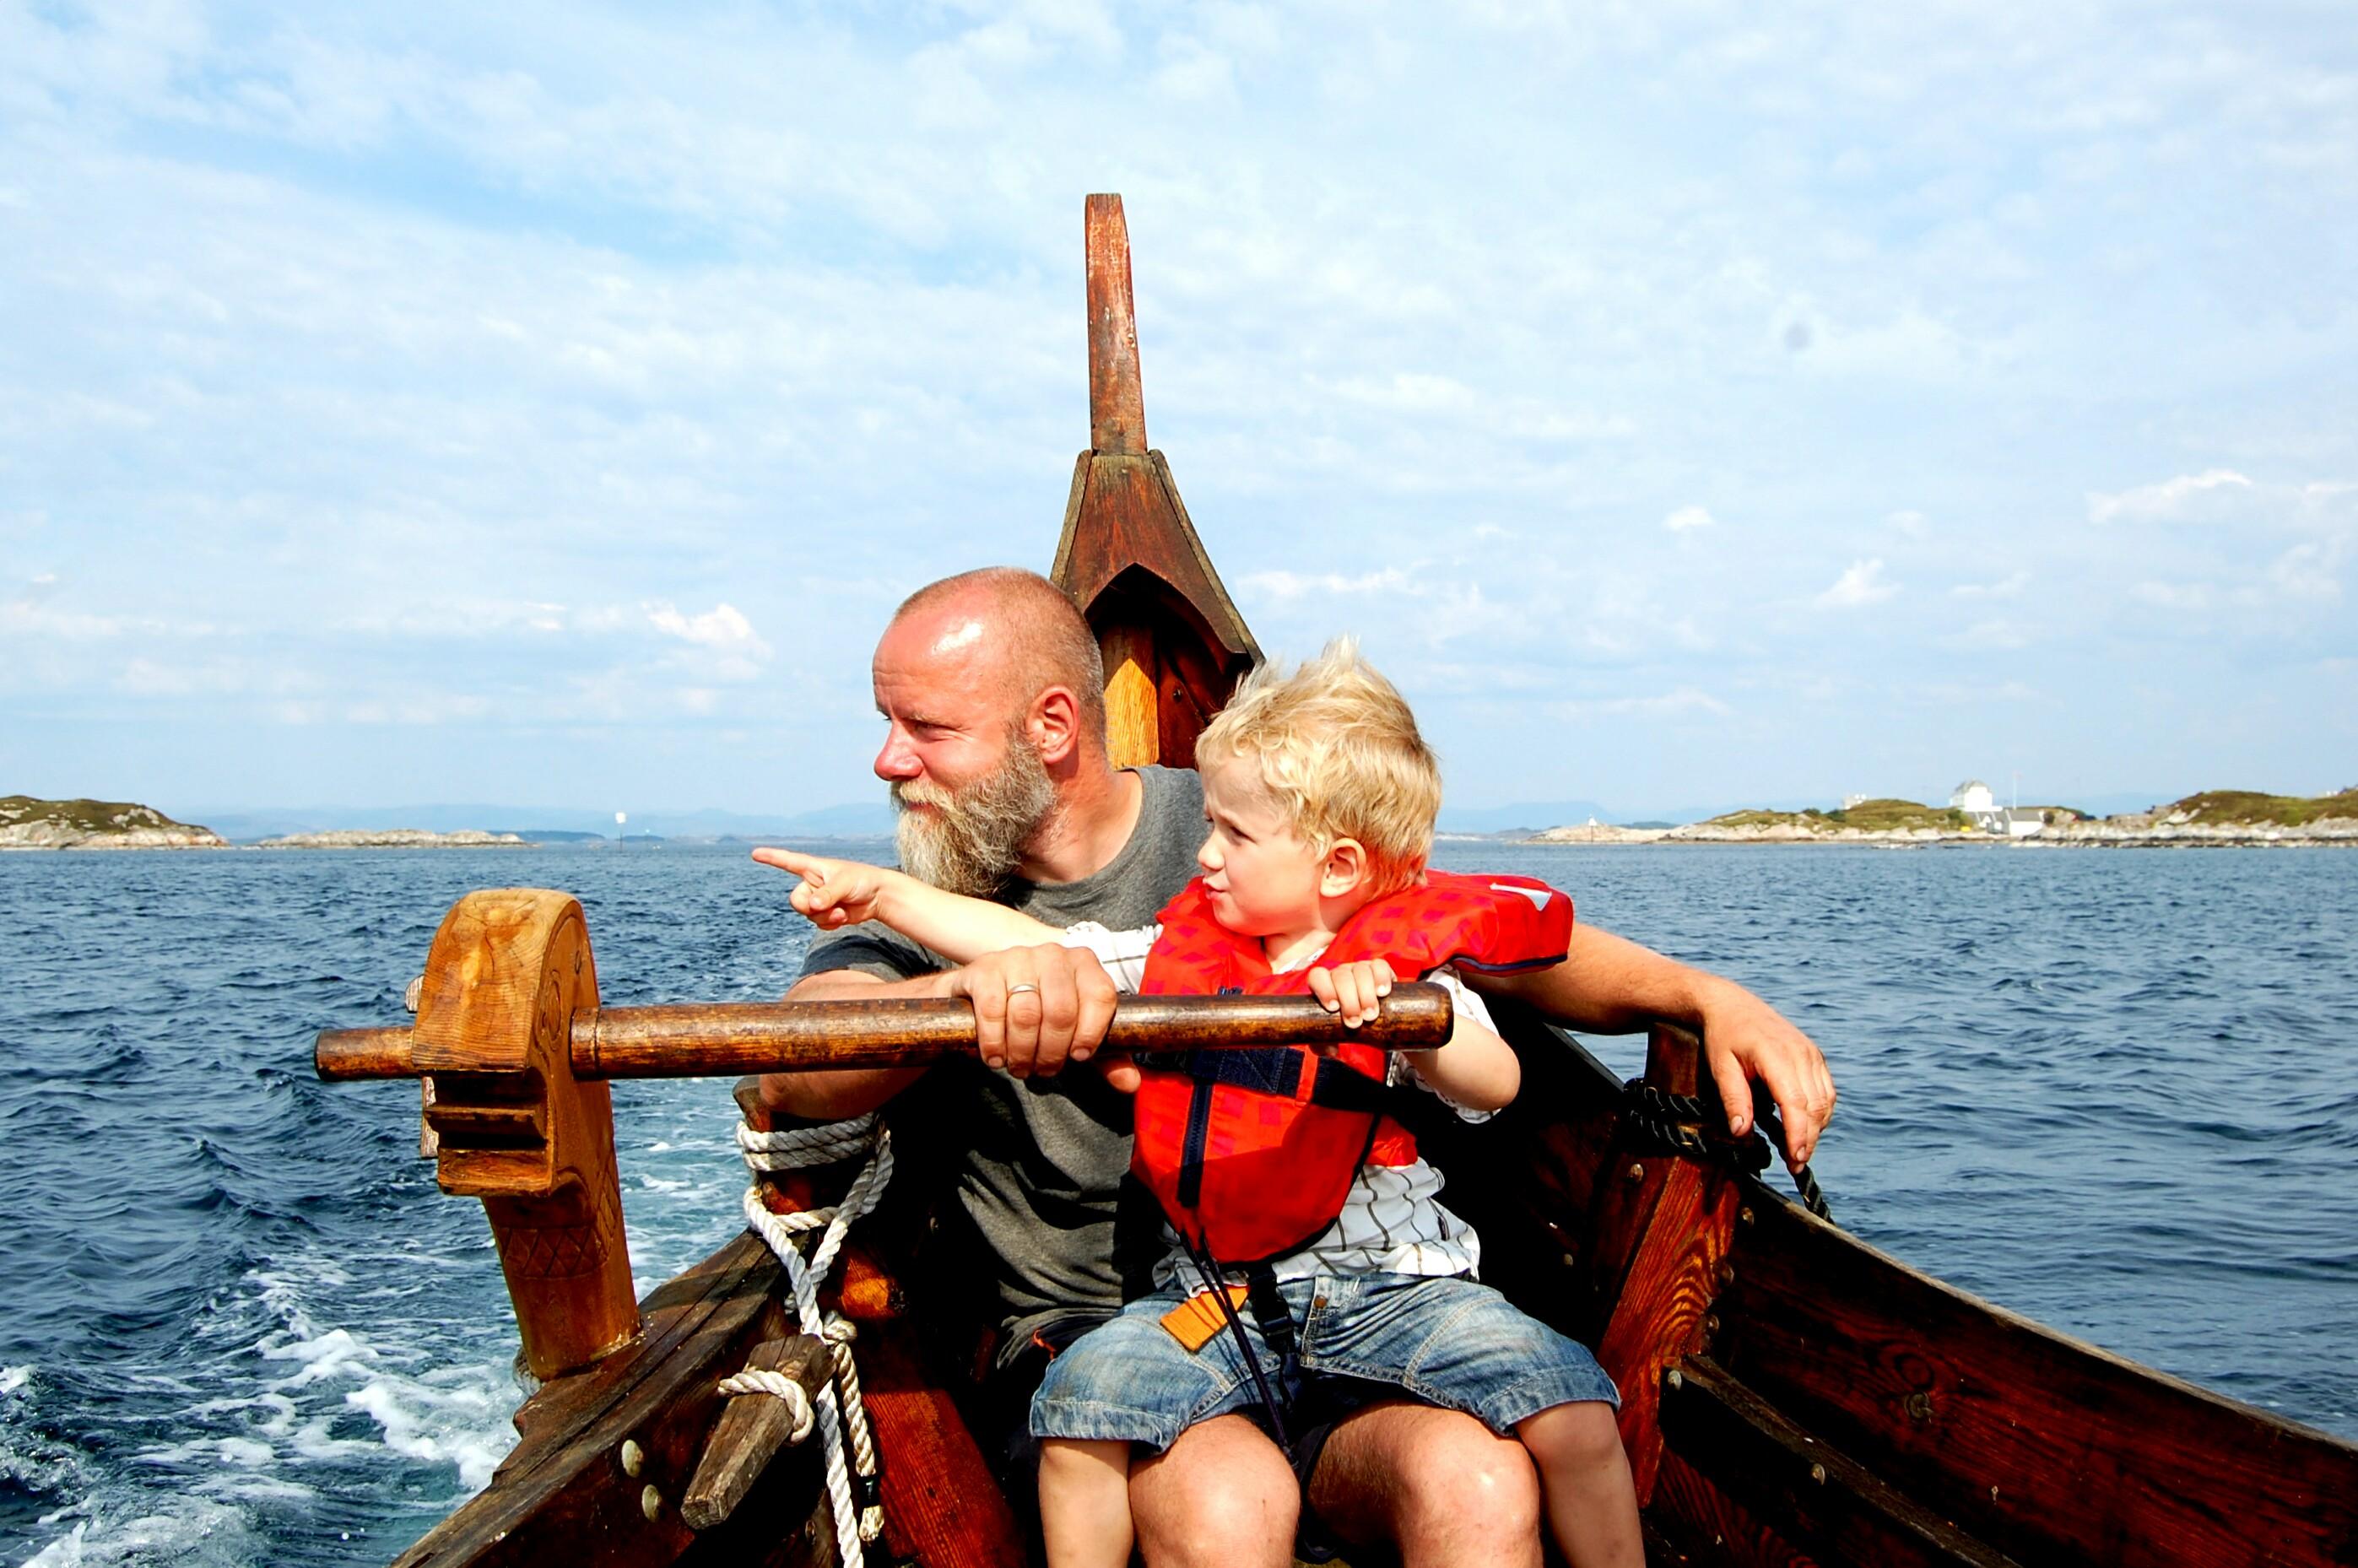 Linda Sæle Kjenes_Ole og David i vikingskipet_vikingferd ved Fedje.png